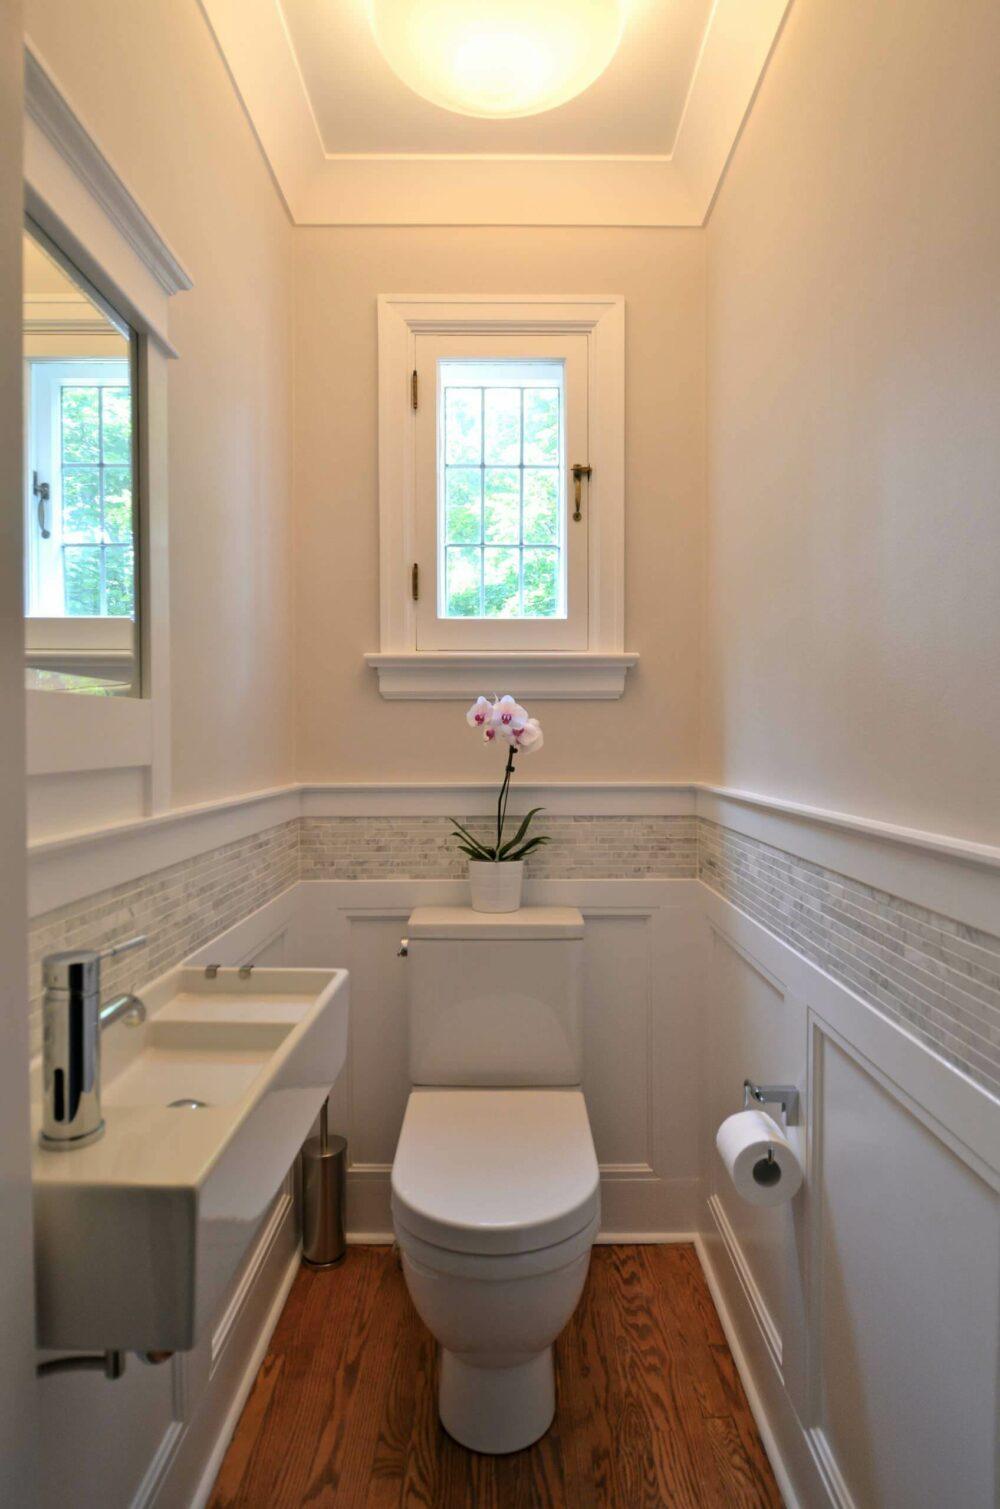 bathroom with wainscoting and tile